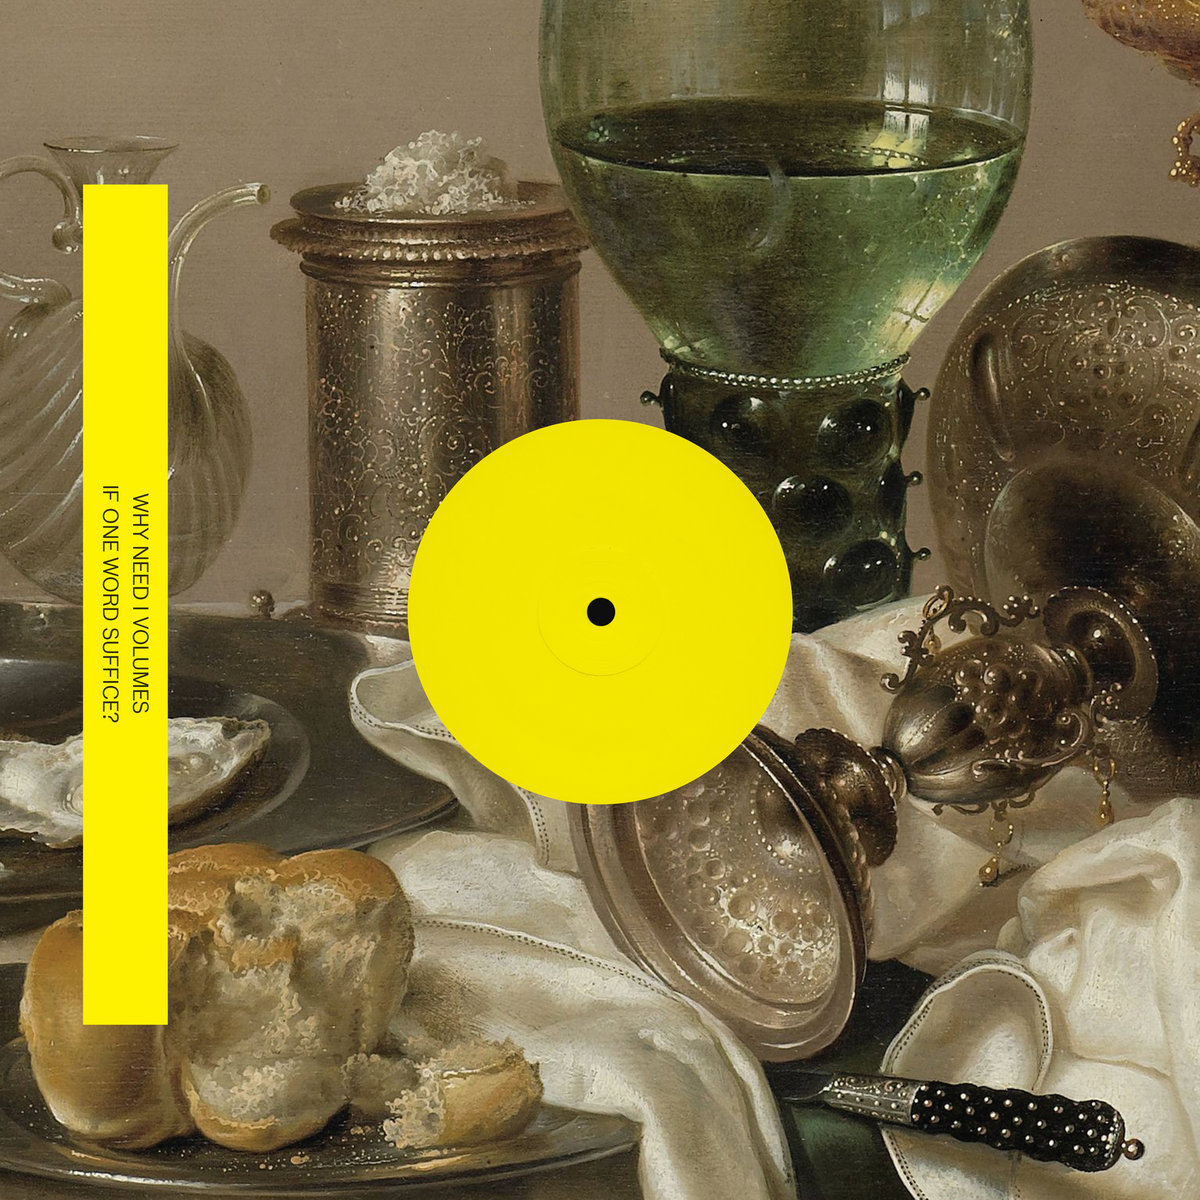 Volumes | Whities